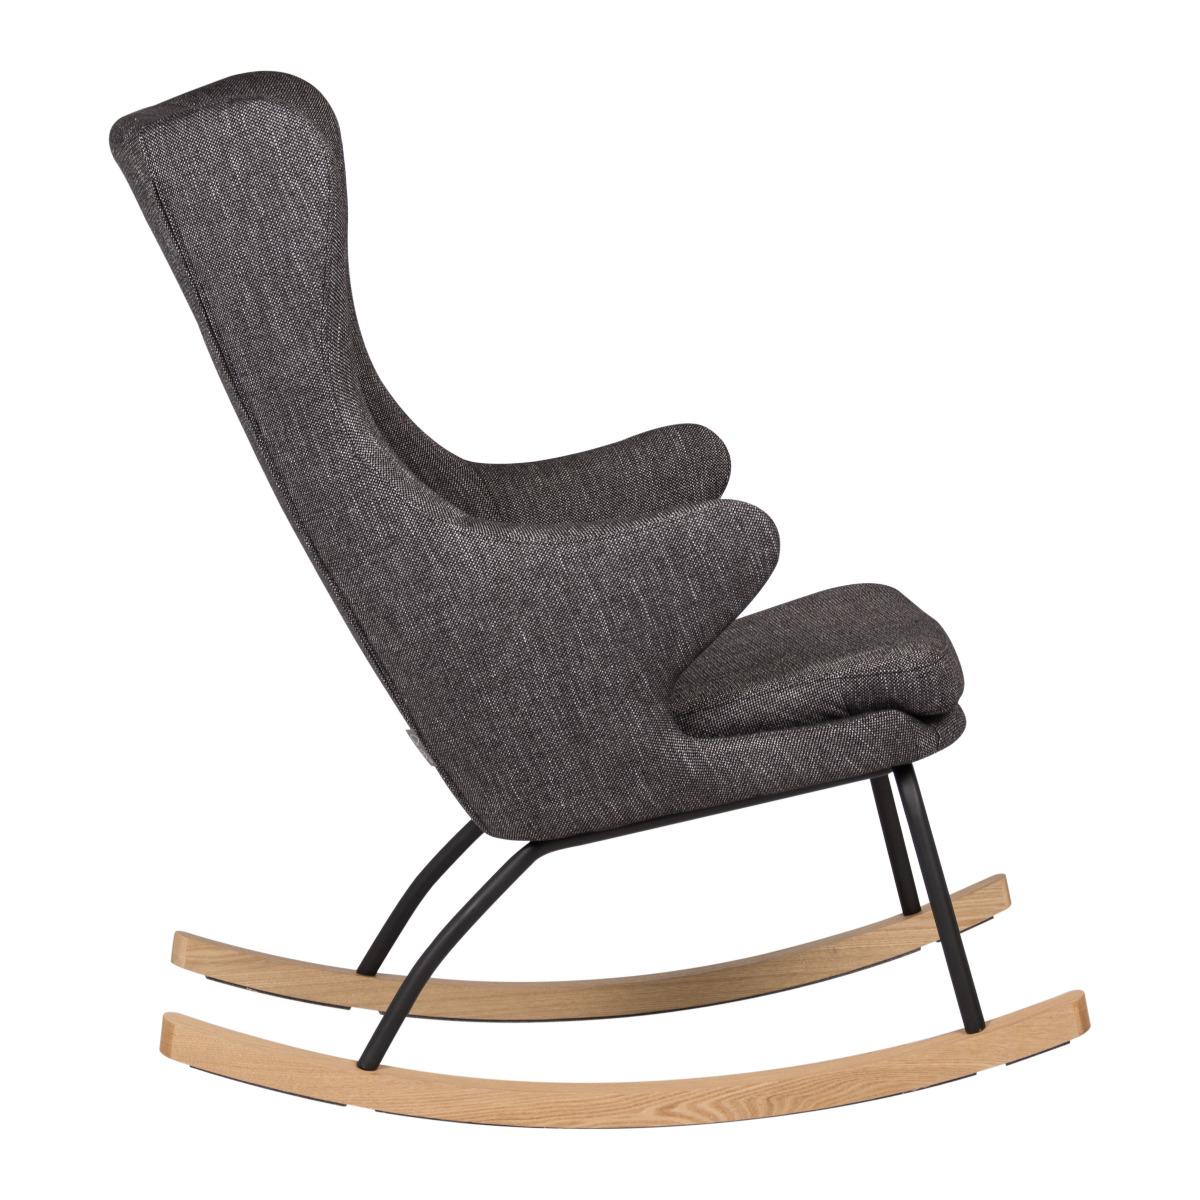 Rocking Chairs Quax Schommelstoel Kinderzeteltje